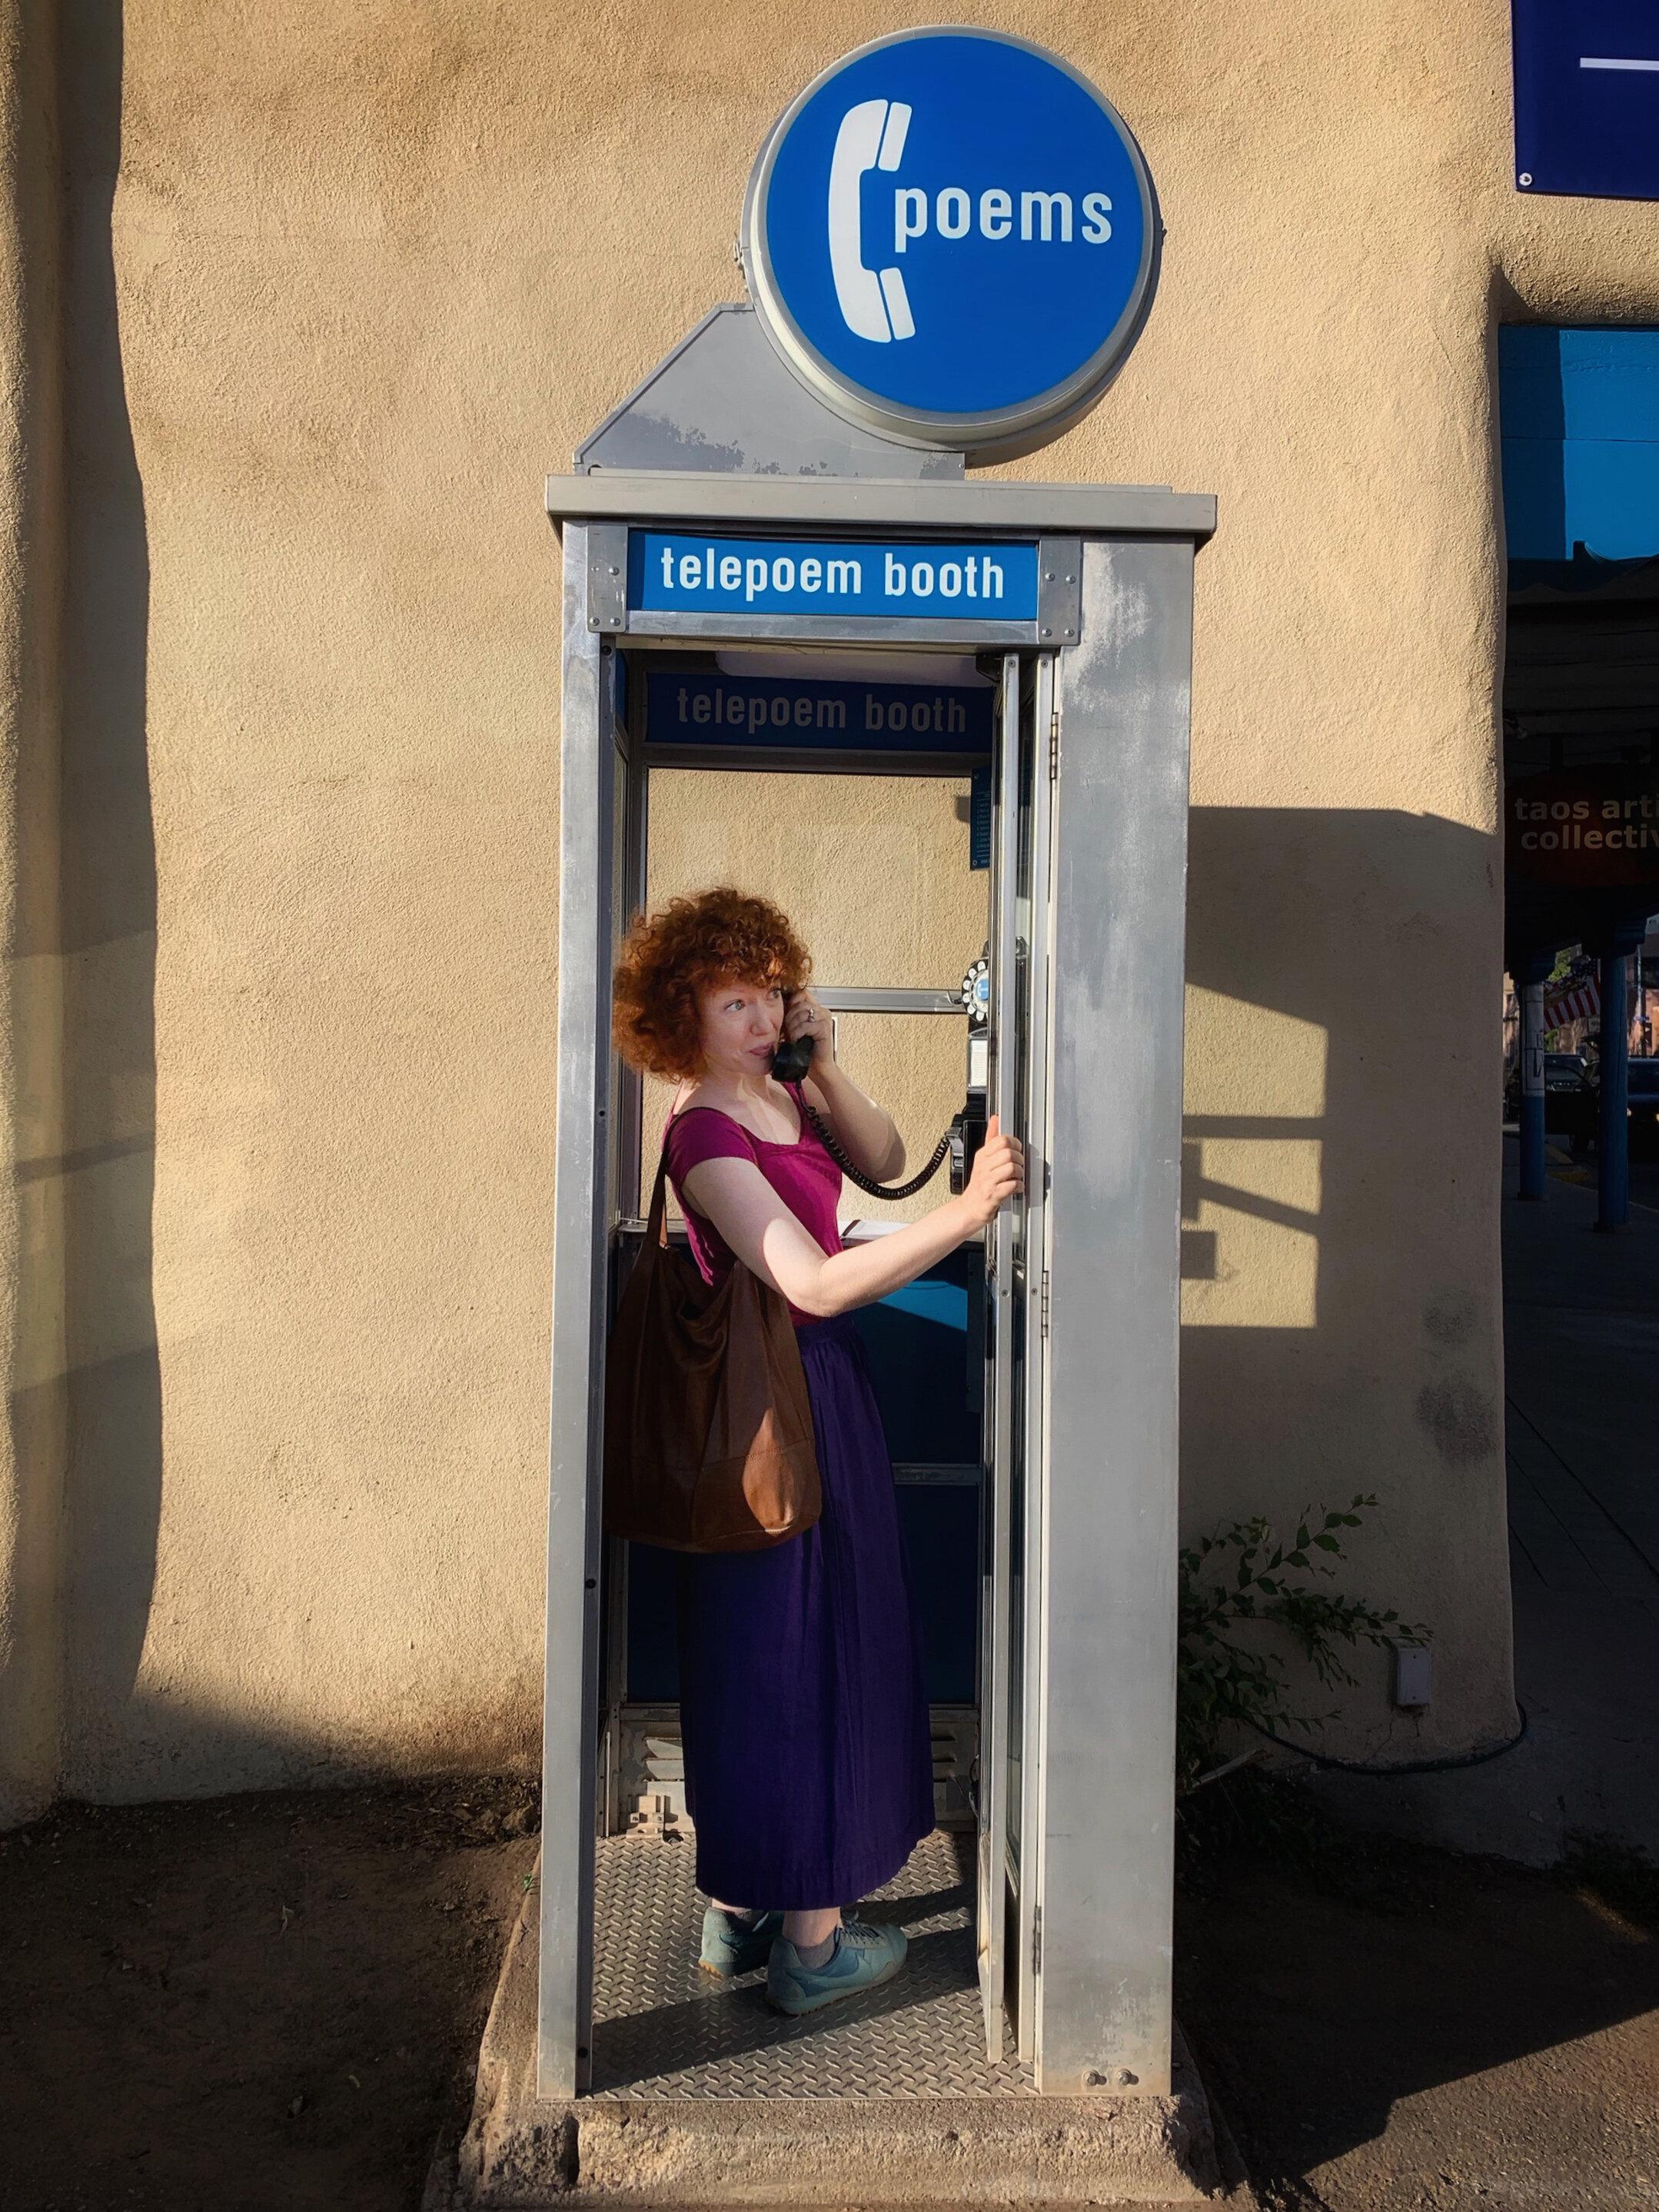 Susannah-Mira_telepoem-booth.JPG